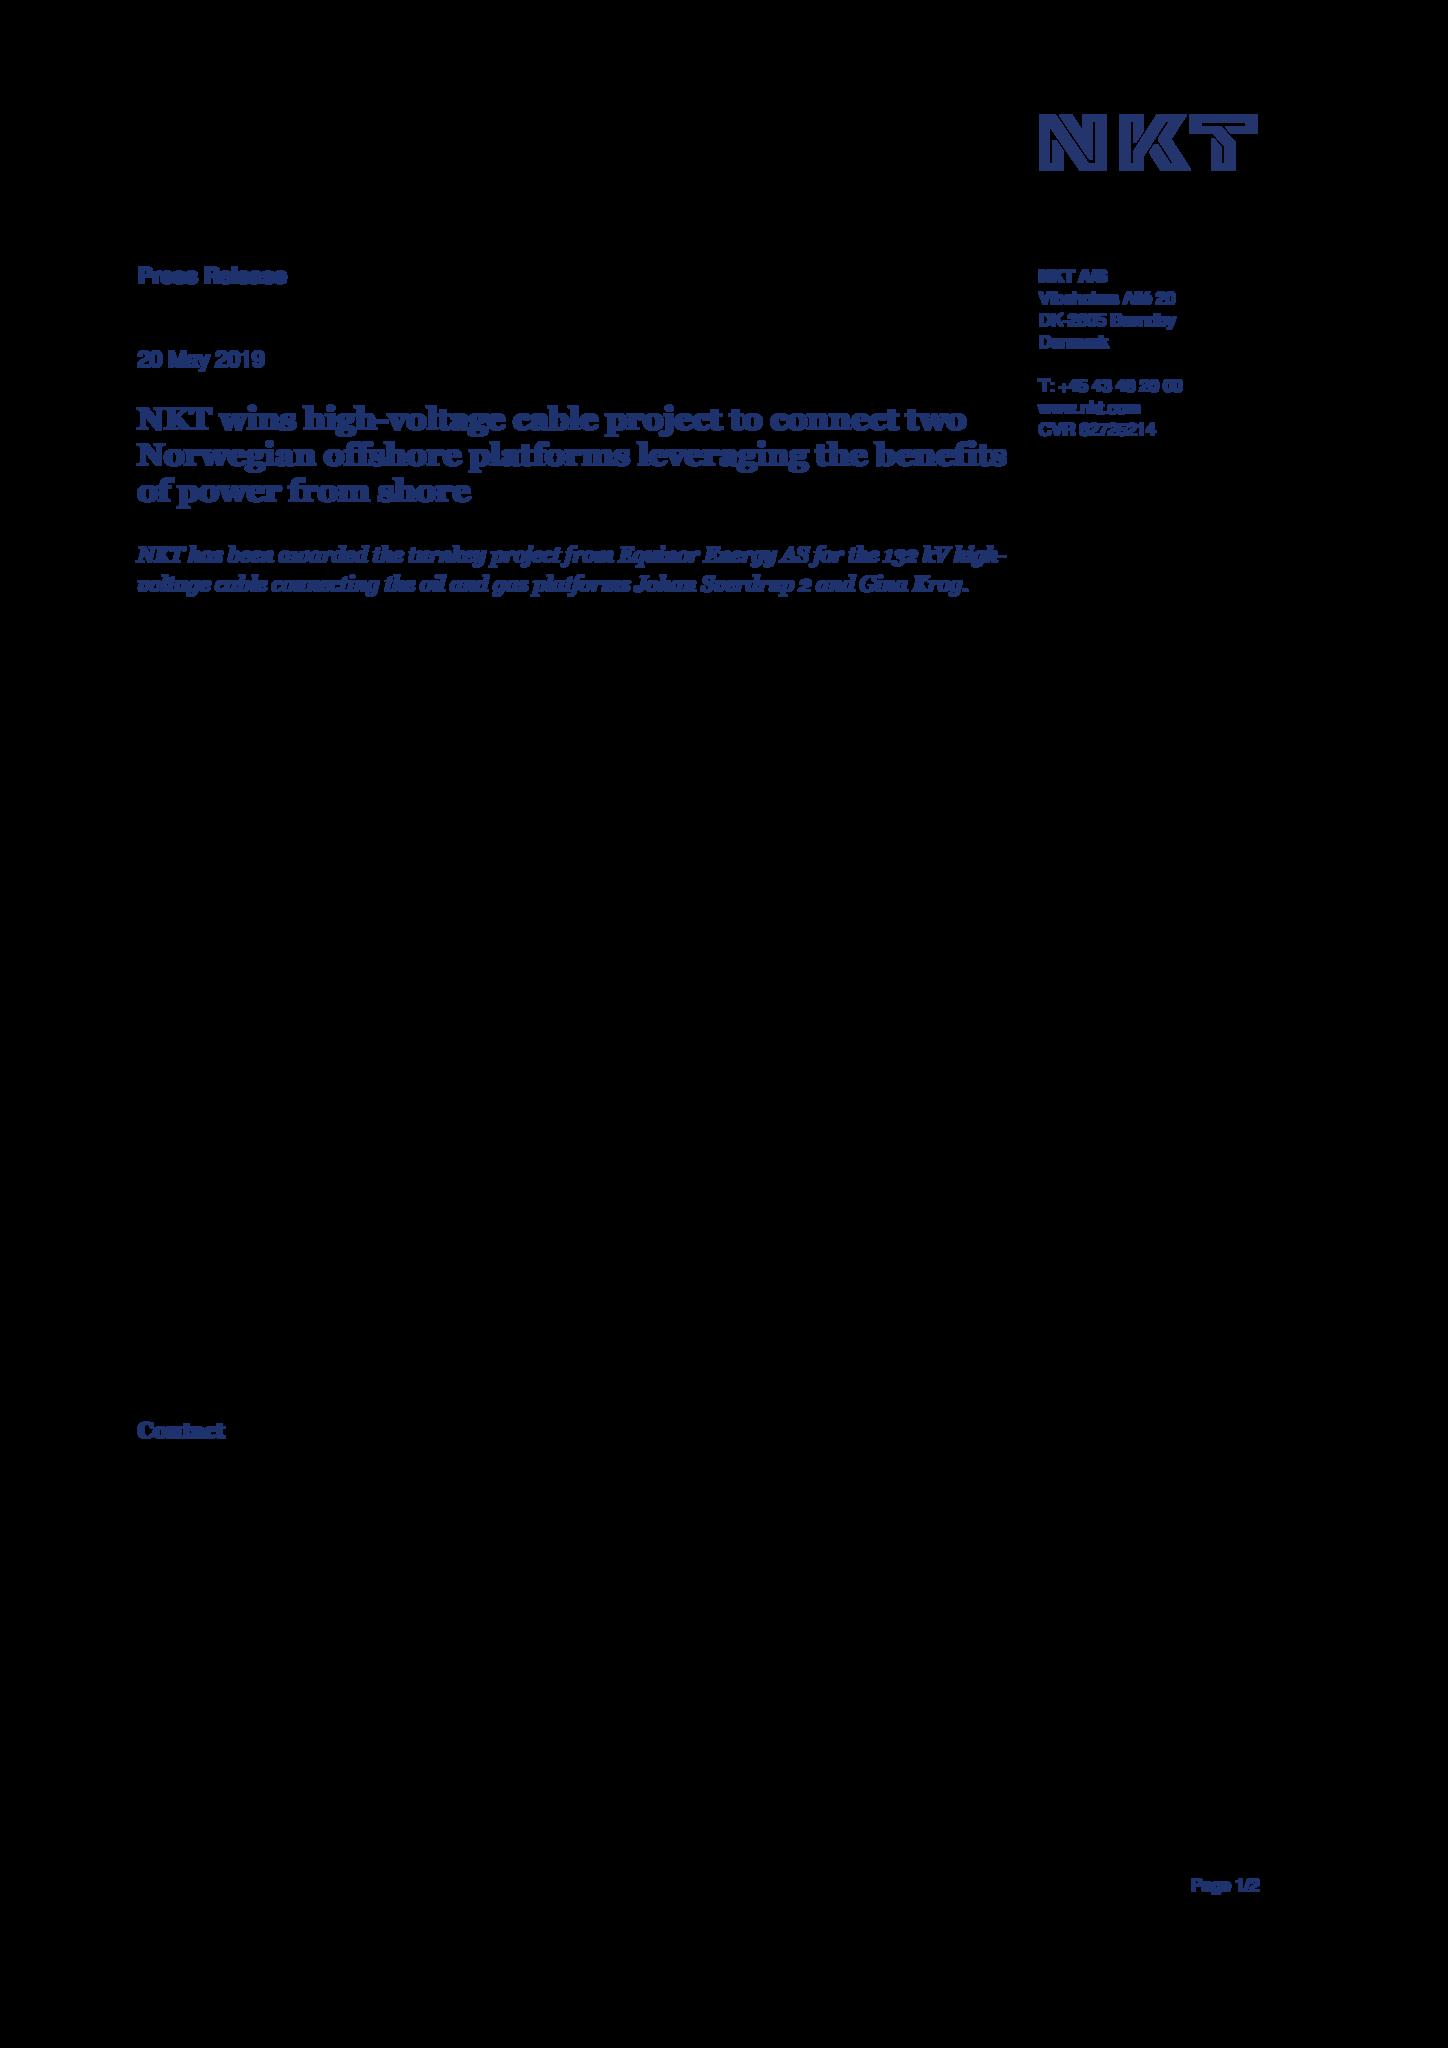 NKT_-_Gina_Krog__press_release.pdf